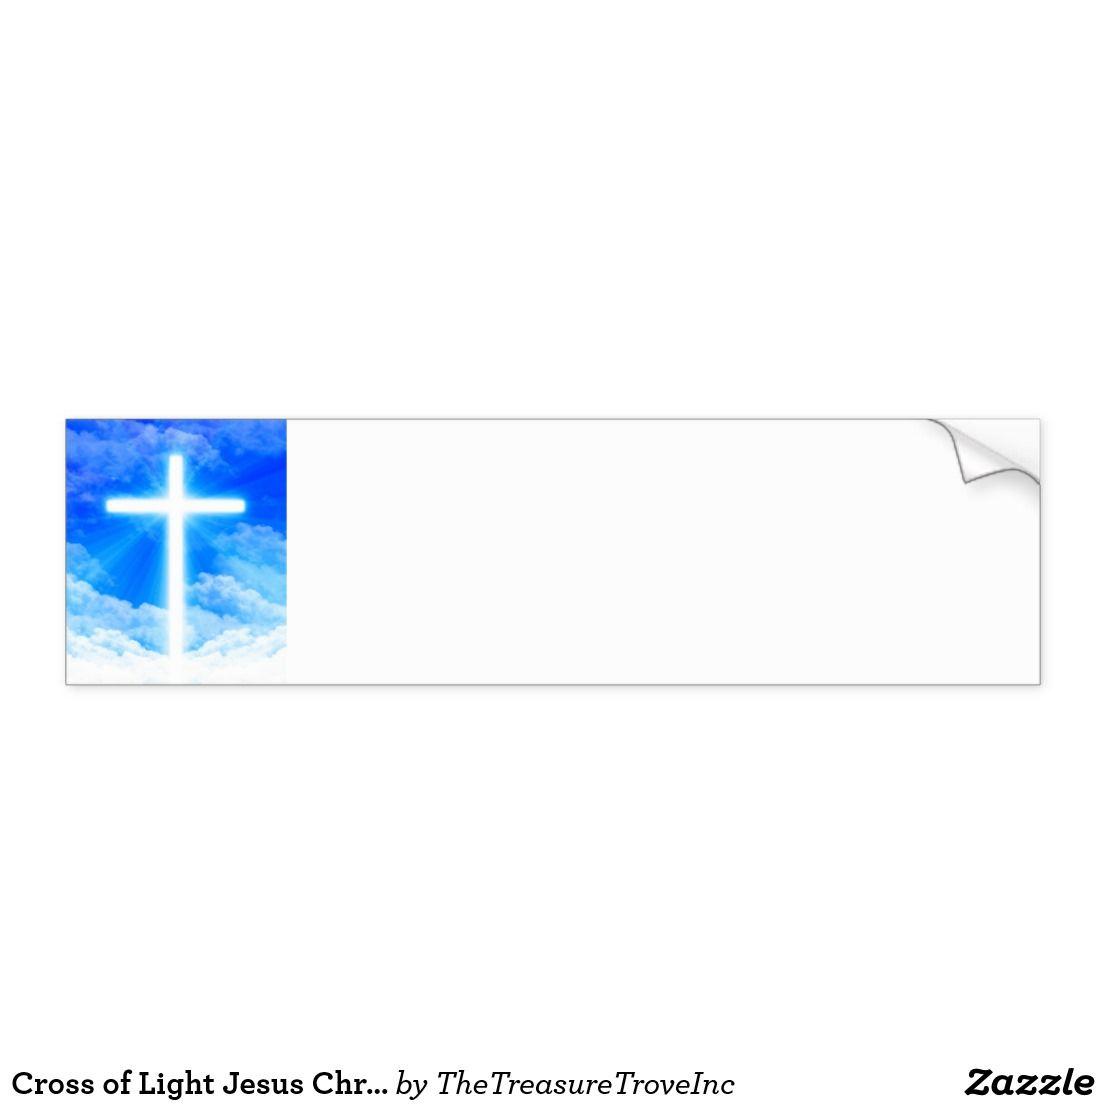 Cross Of Light Jesus Christ Customizable Christian Bumper Sticker Zazzle Com Christian Messages Jesus Christ Bumper Stickers [ 1106 x 1106 Pixel ]